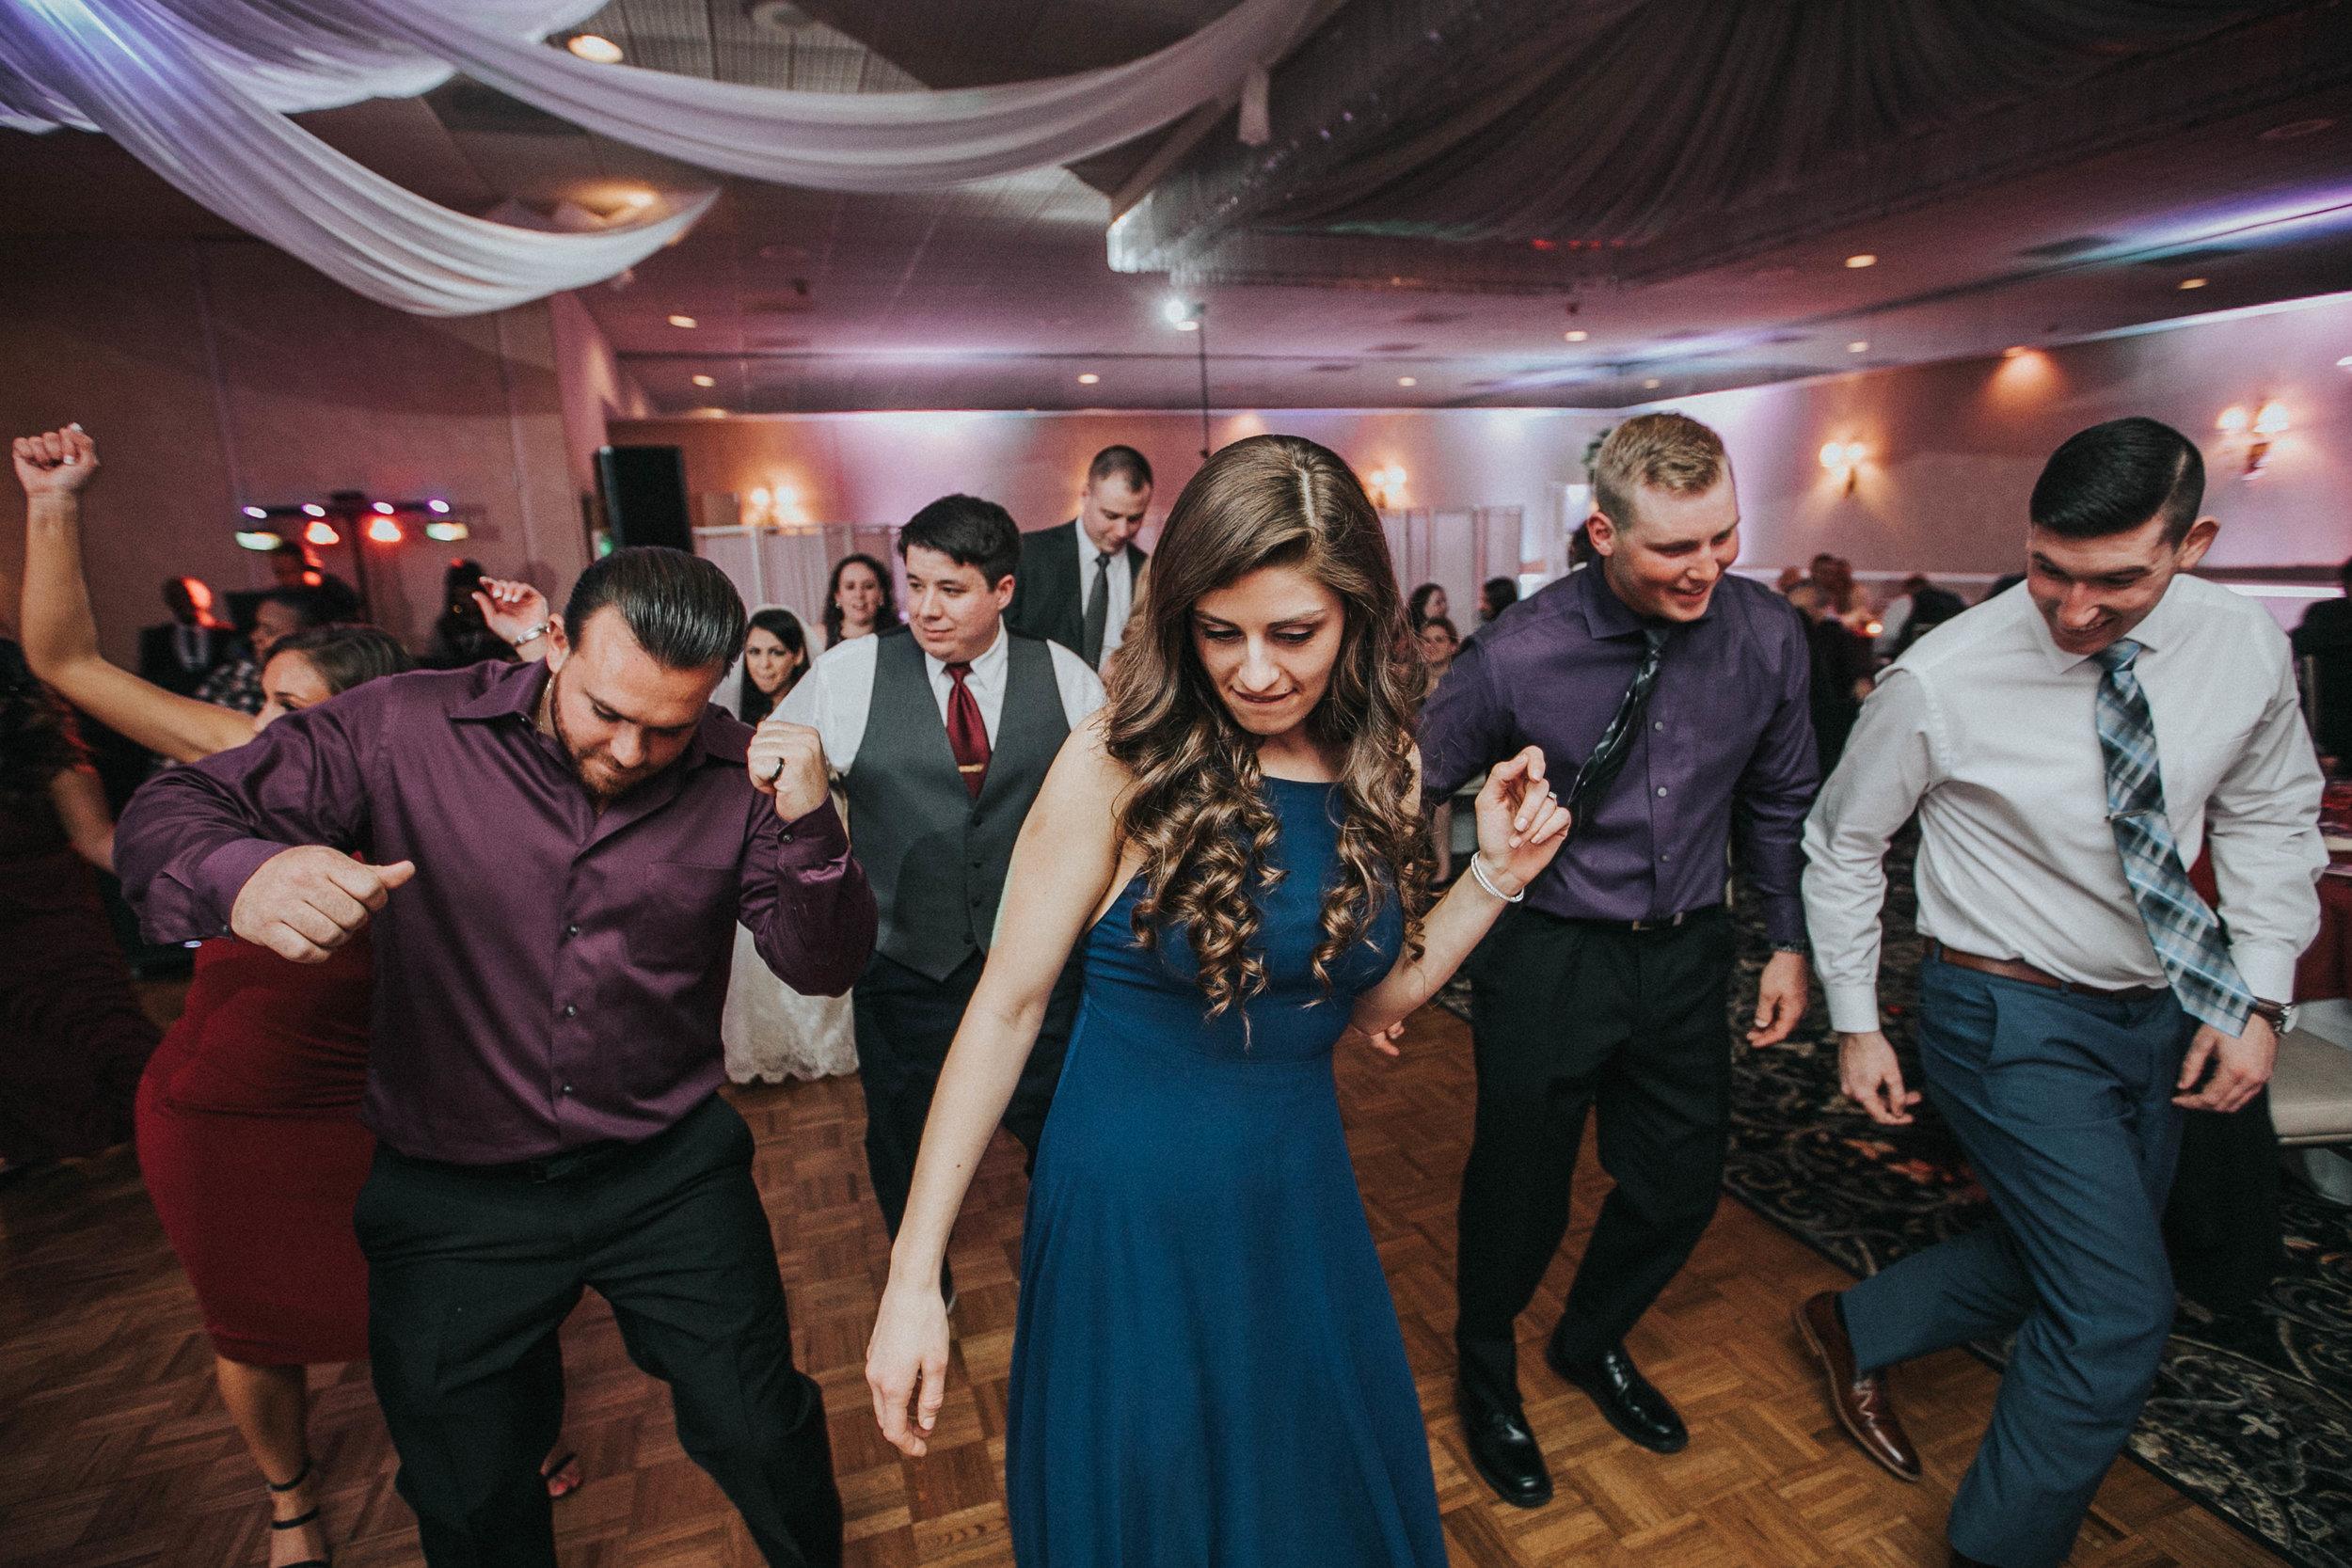 New-Jersey-Wedding-Photographer-ReceptionCenter-Valeria&Mike-Reception (96 of 265).jpg